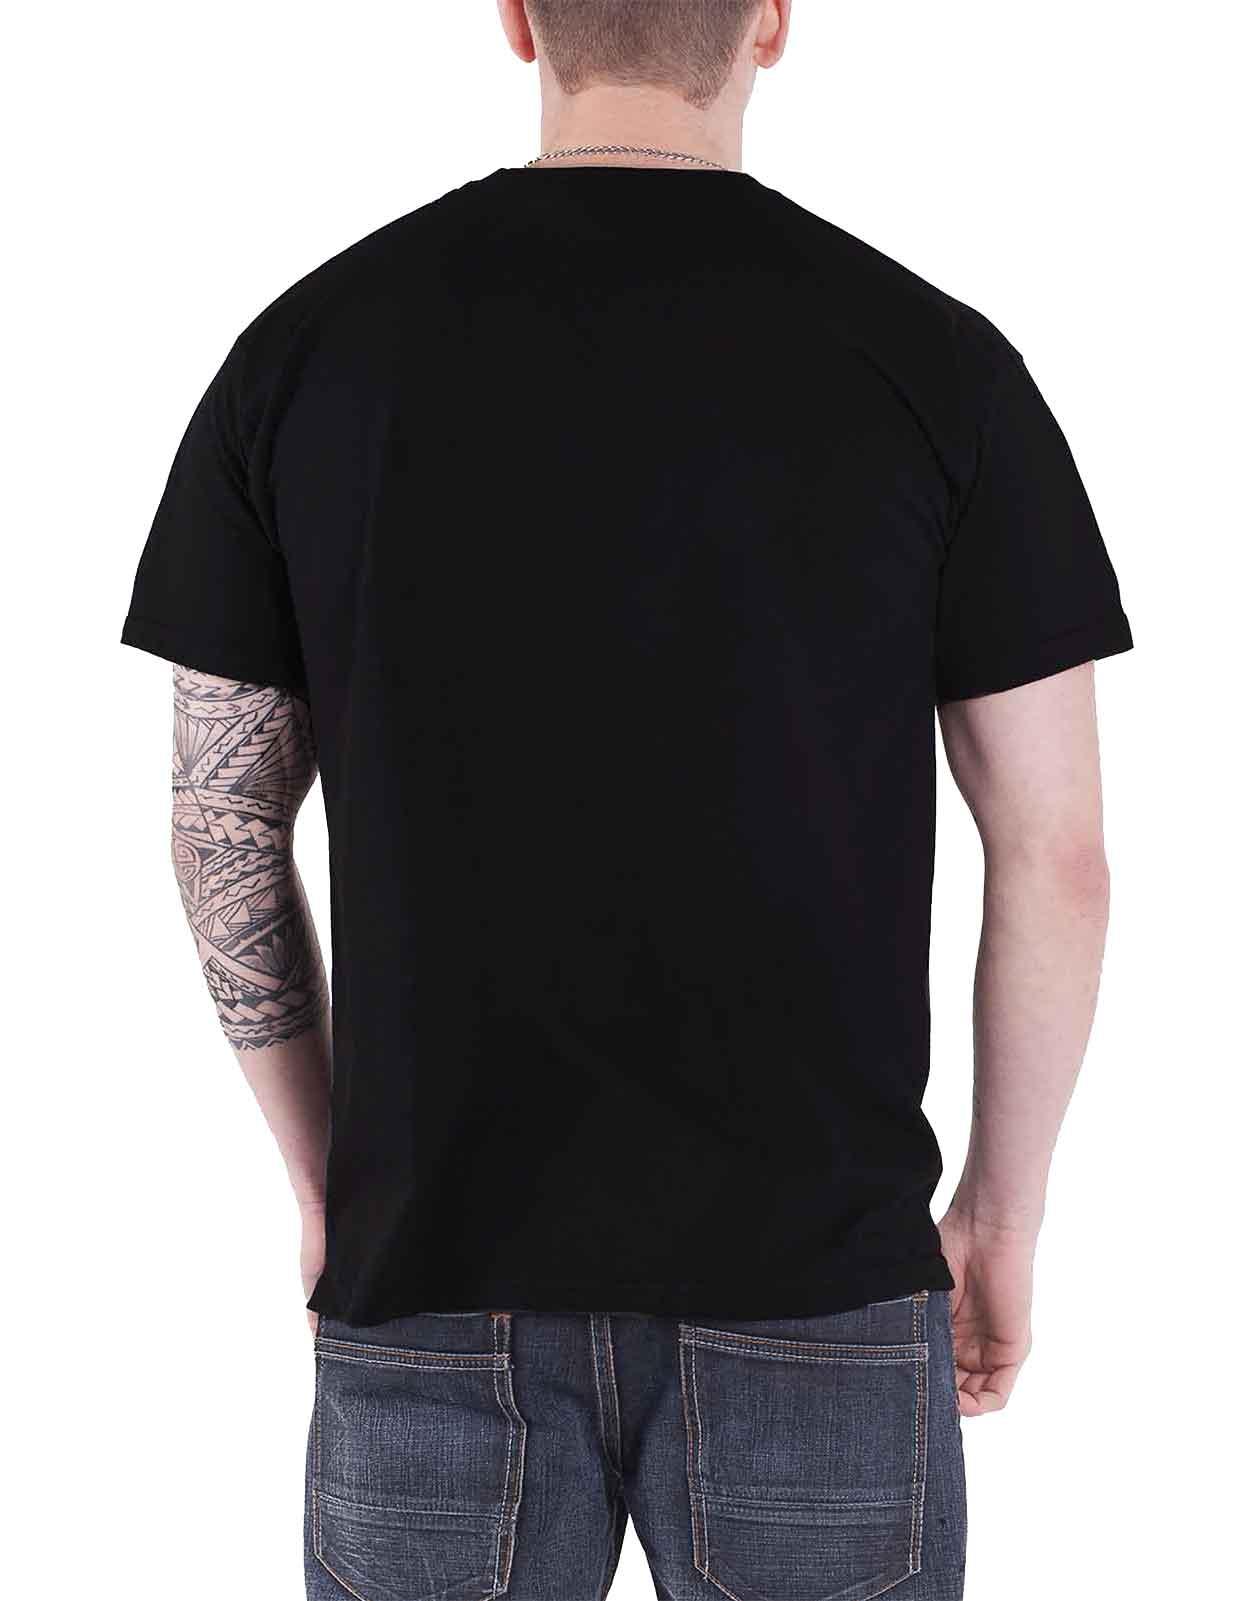 Motorhead-T-Shirt-Lemmy-RIP-England-warpig-clean-your-clock-official-new-mens Indexbild 11